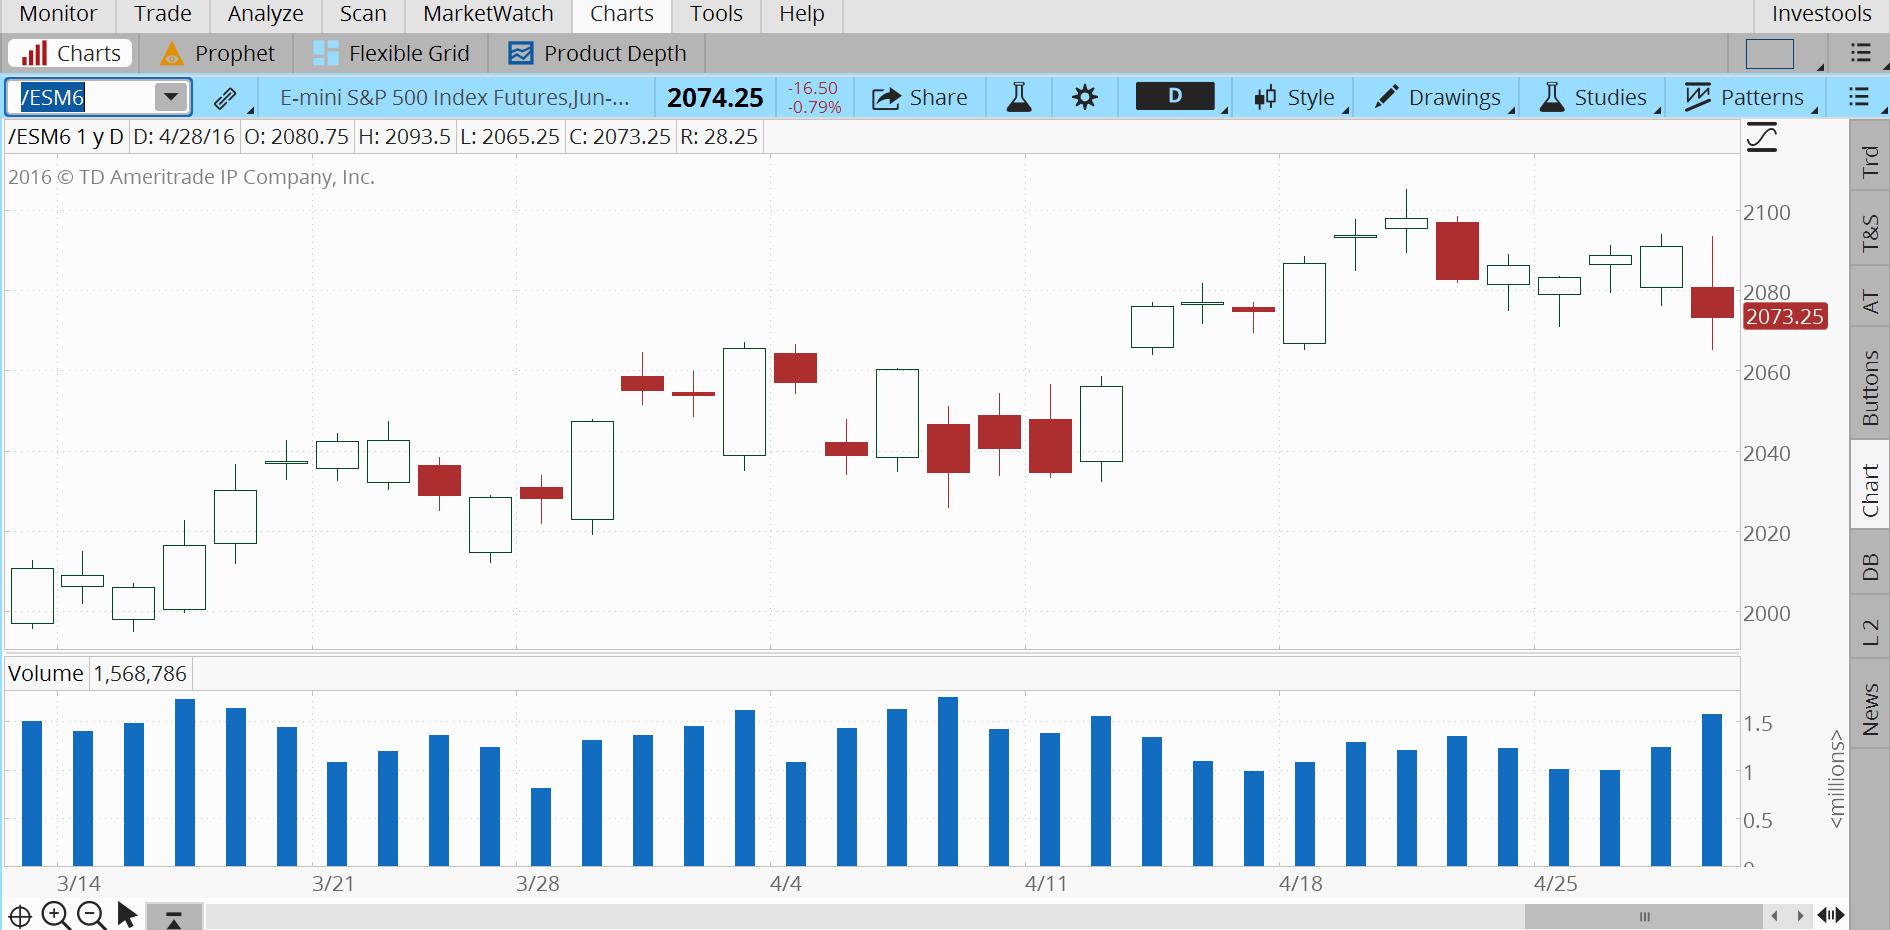 E-mini S&P 500 Index Futures chart